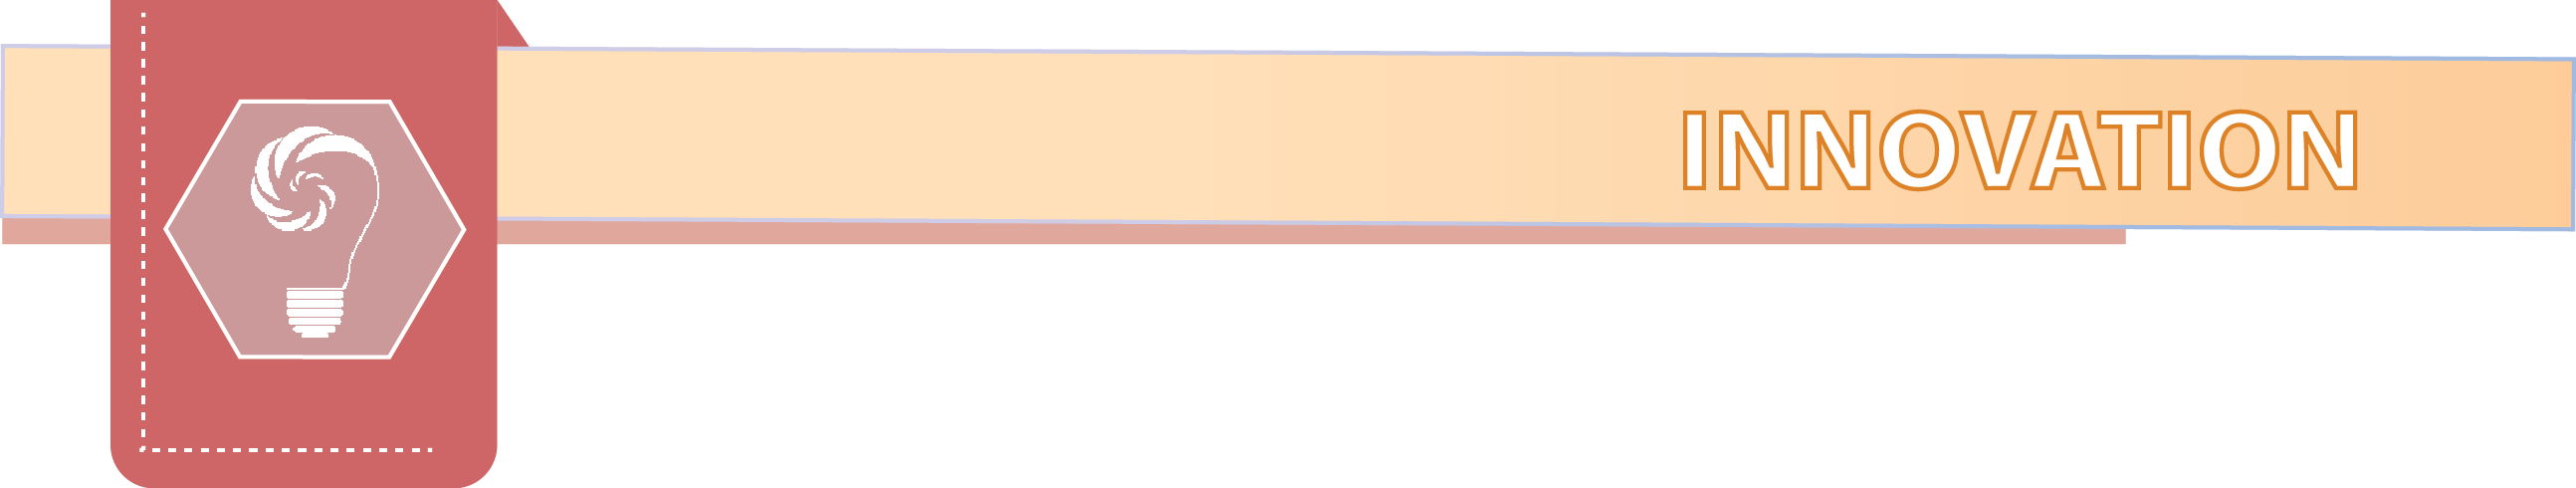 sinp close relative application guide